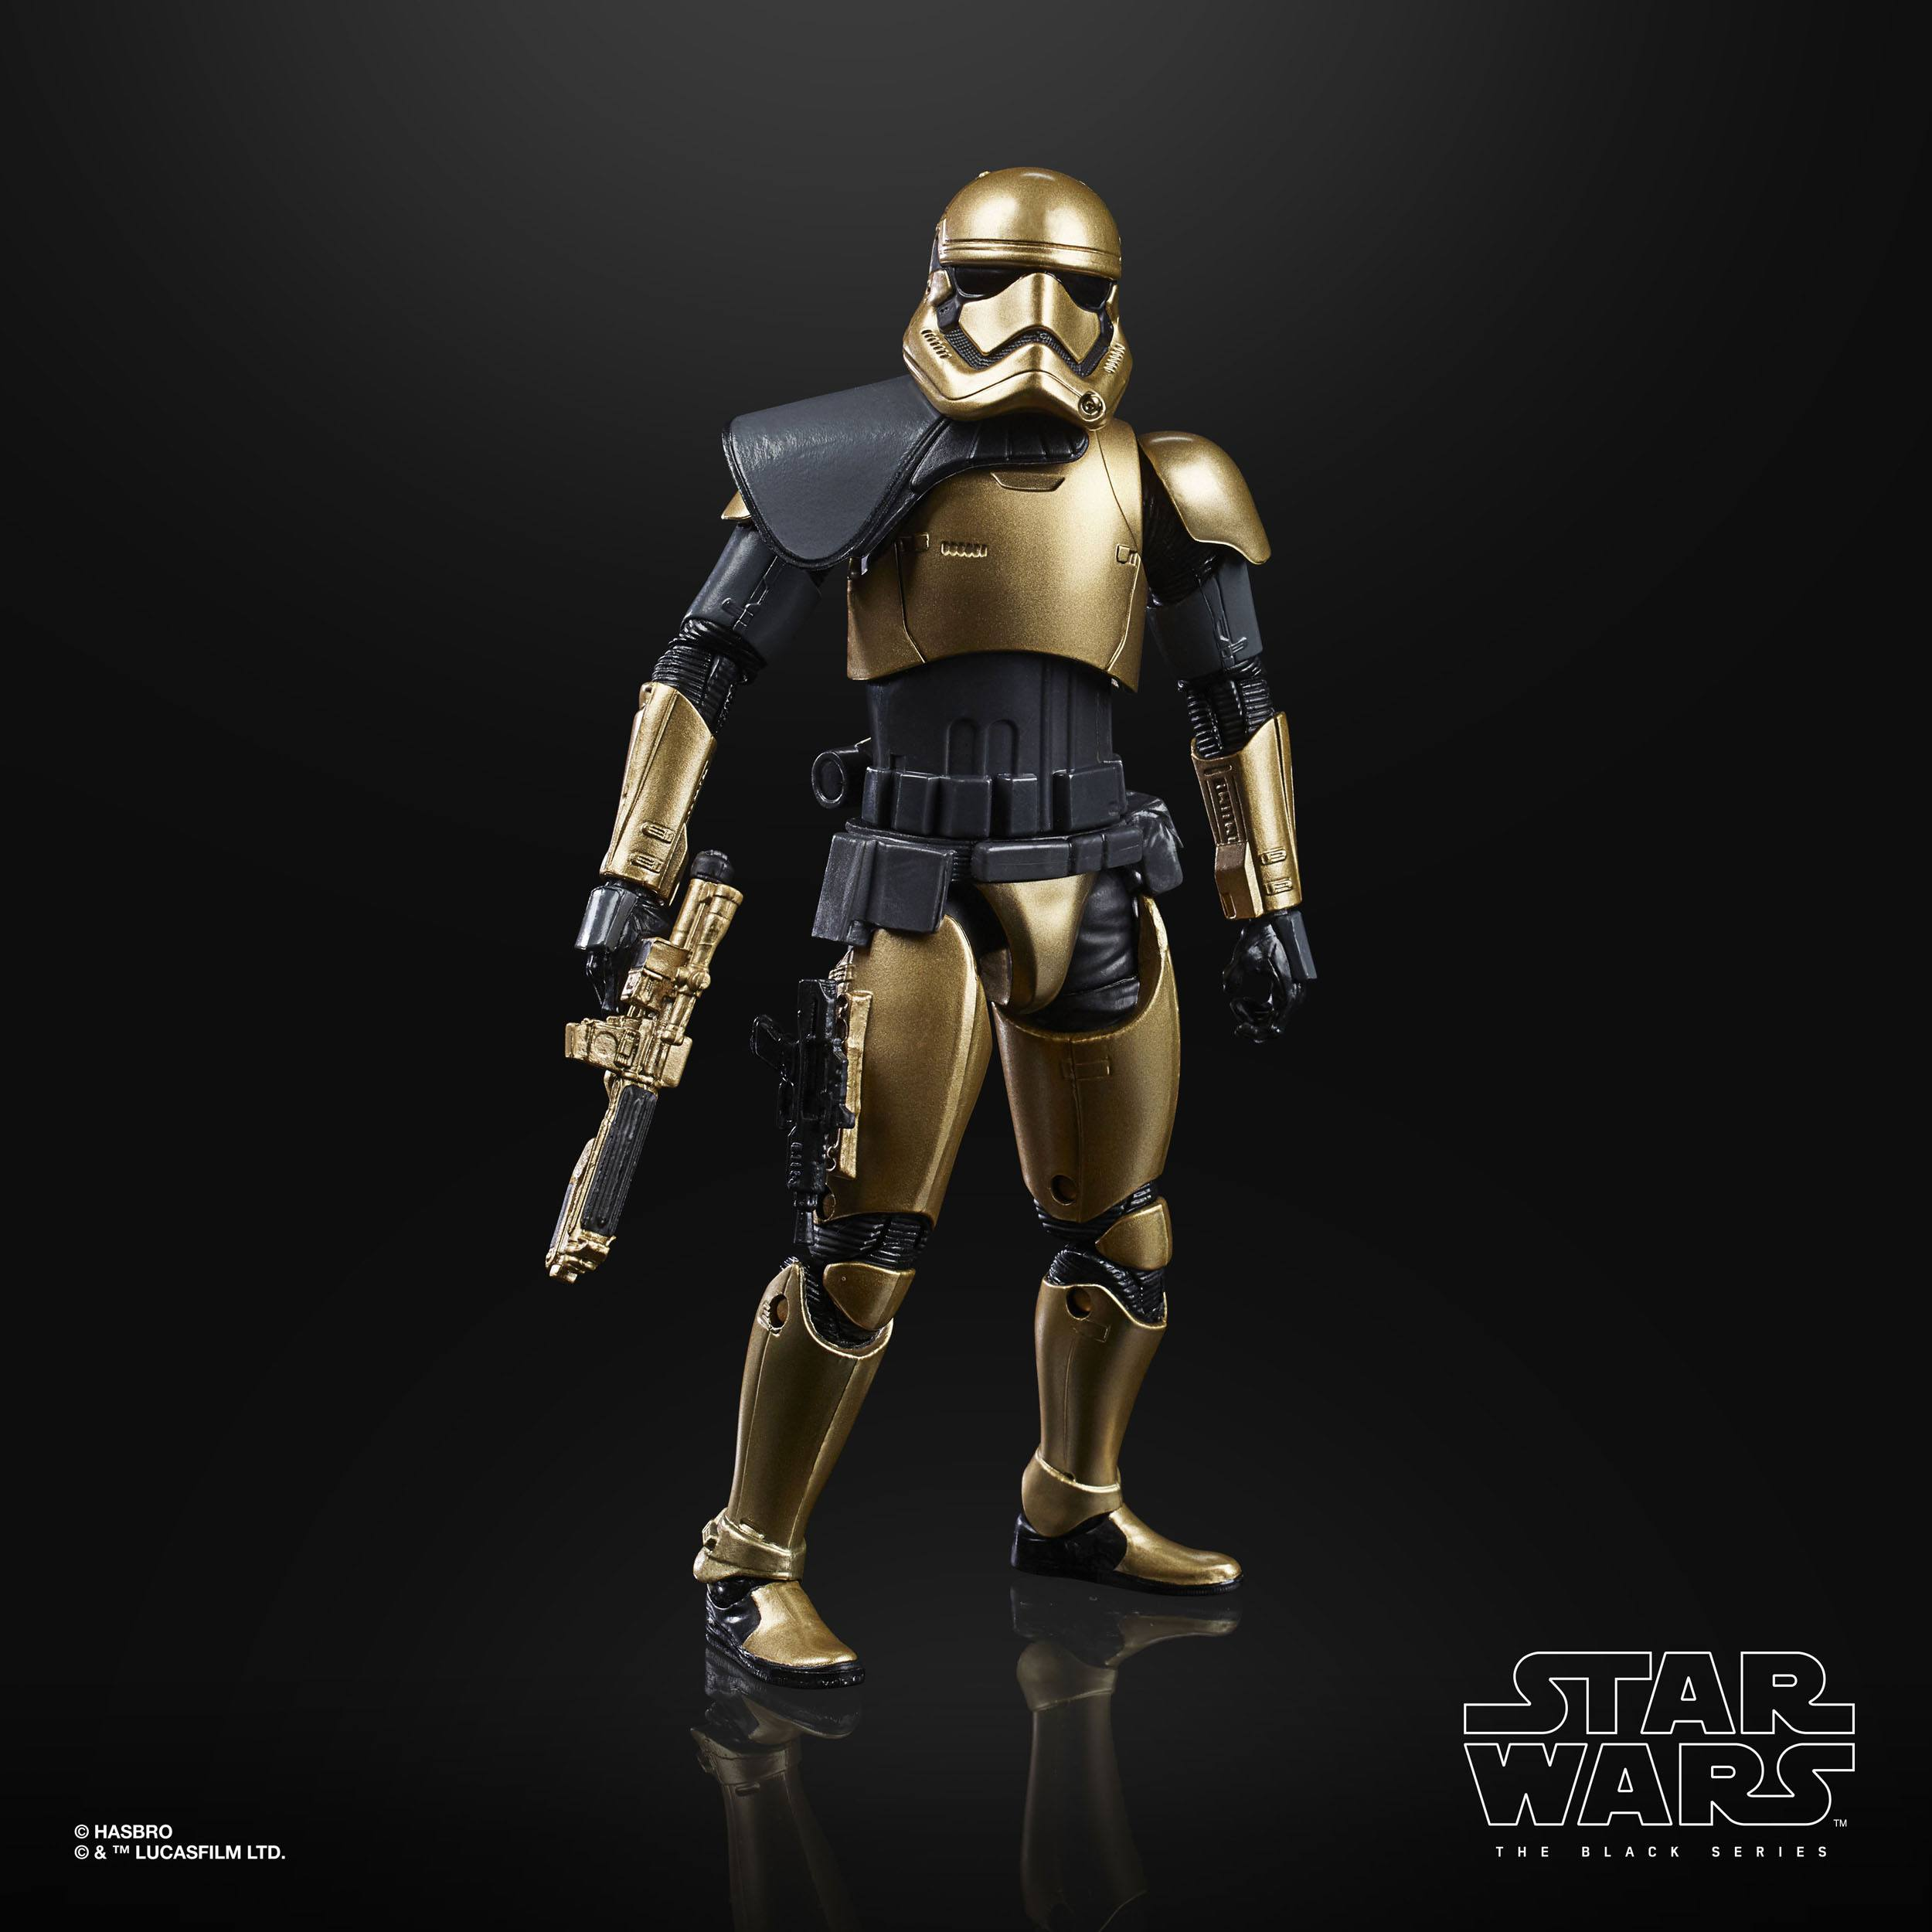 Star Wars Galaxy's Edge Black Series Commander Pyre 15 cm HASF1188 5010993773138